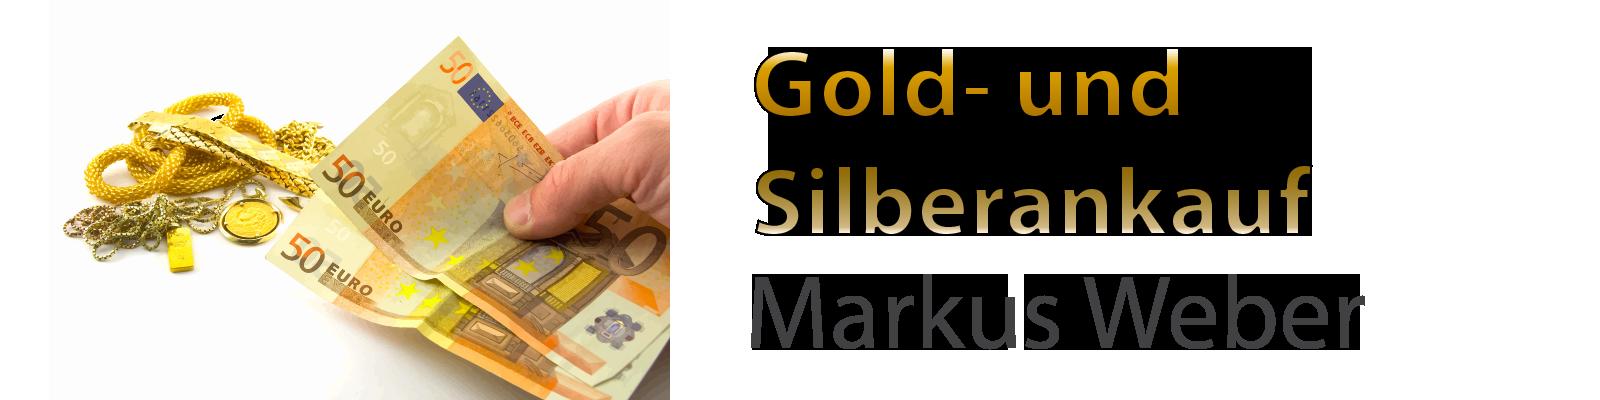 Goldankauf Kirchheimbolanden - Markus Weber